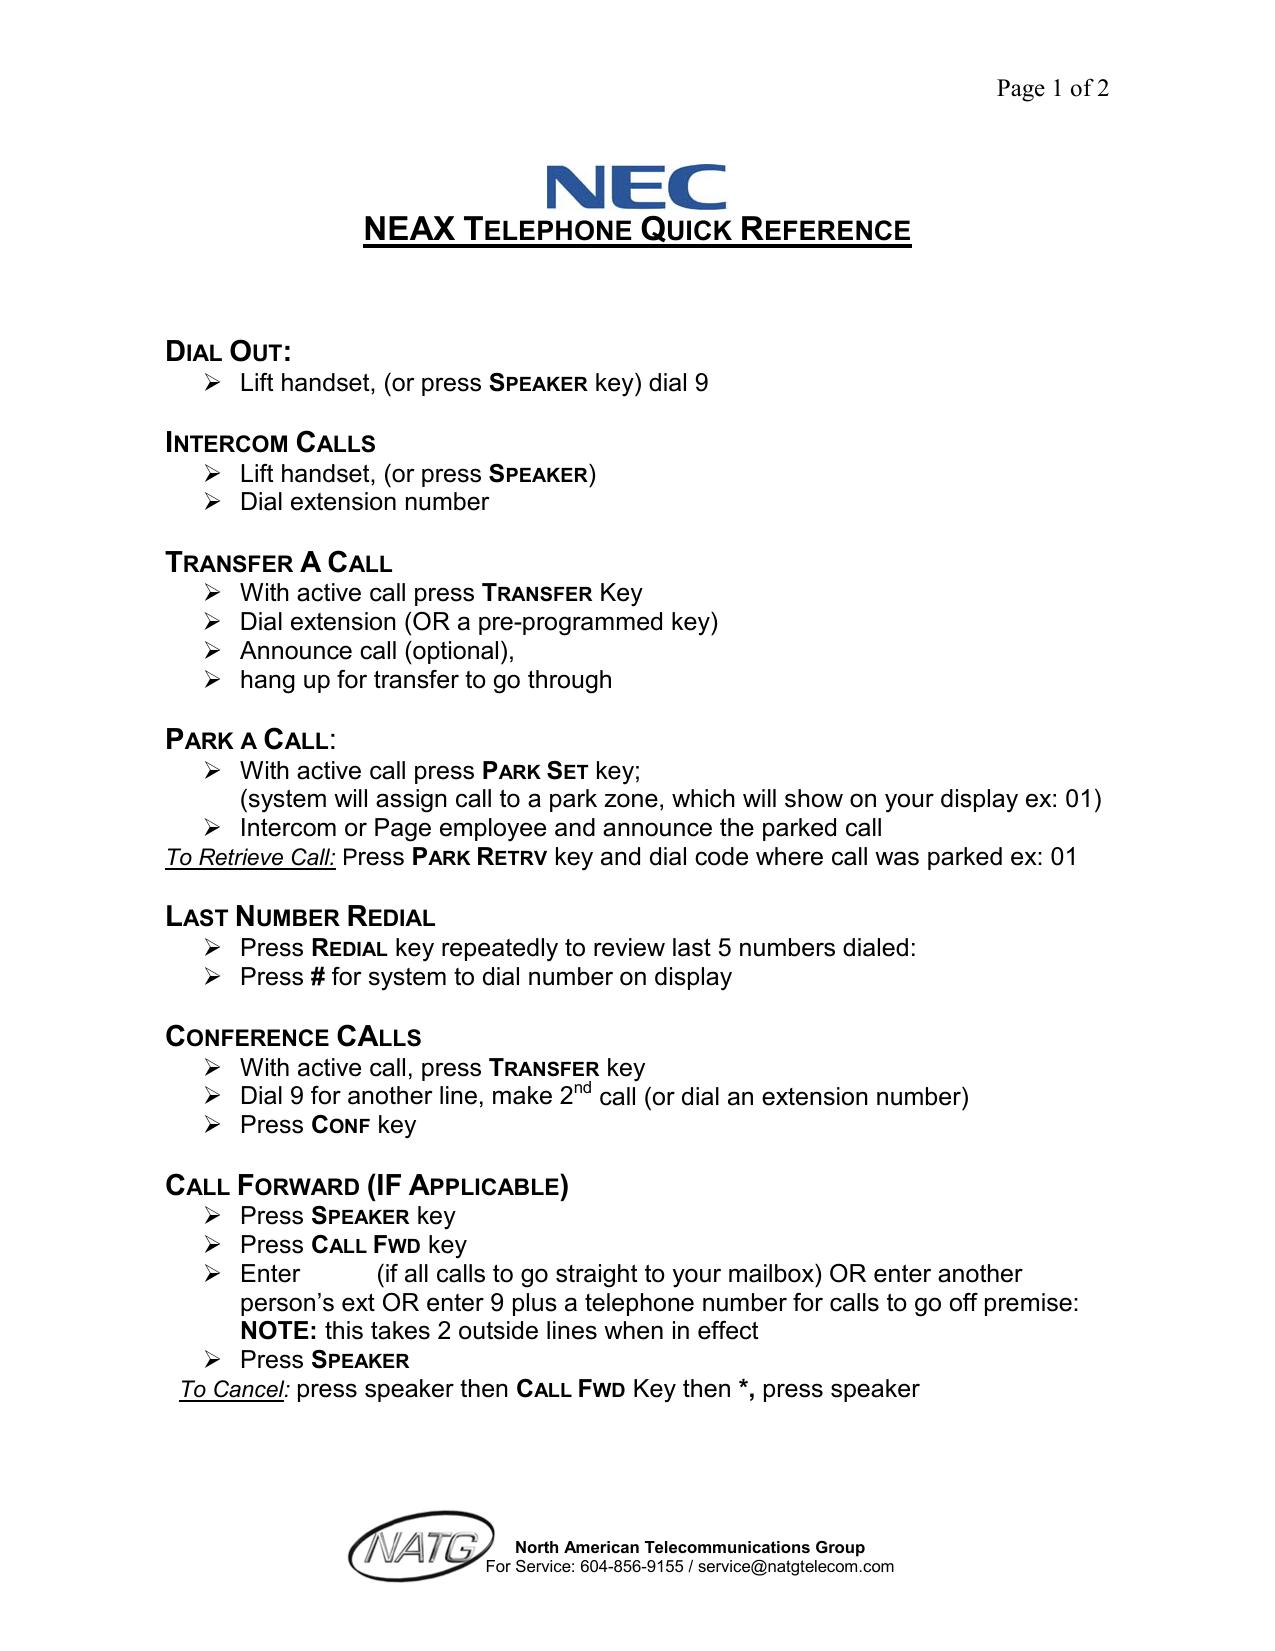 quick reference for nec telephones | manualzz com